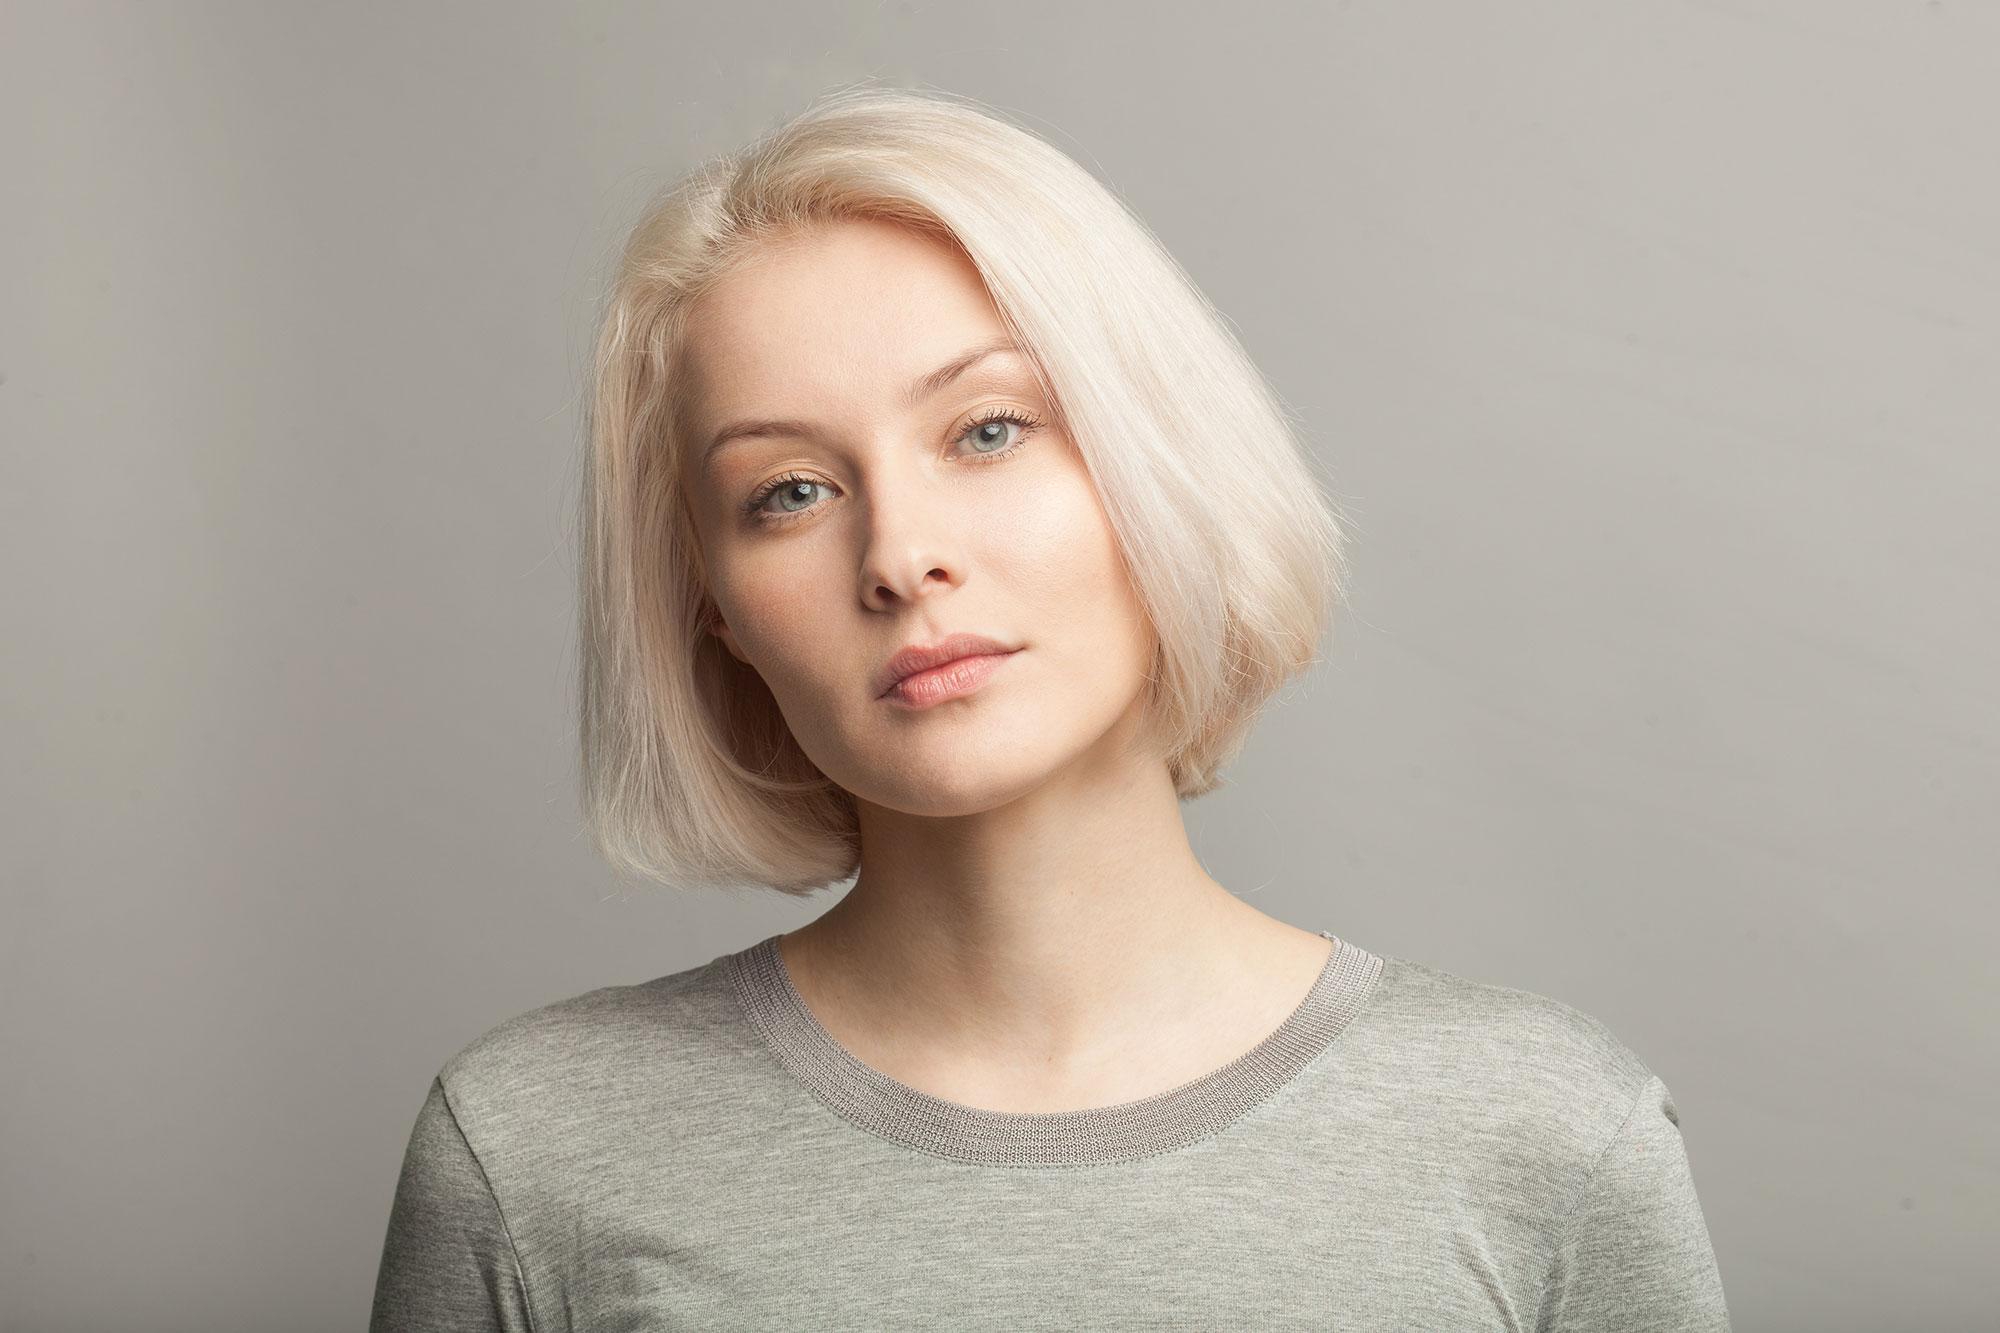 light skin type